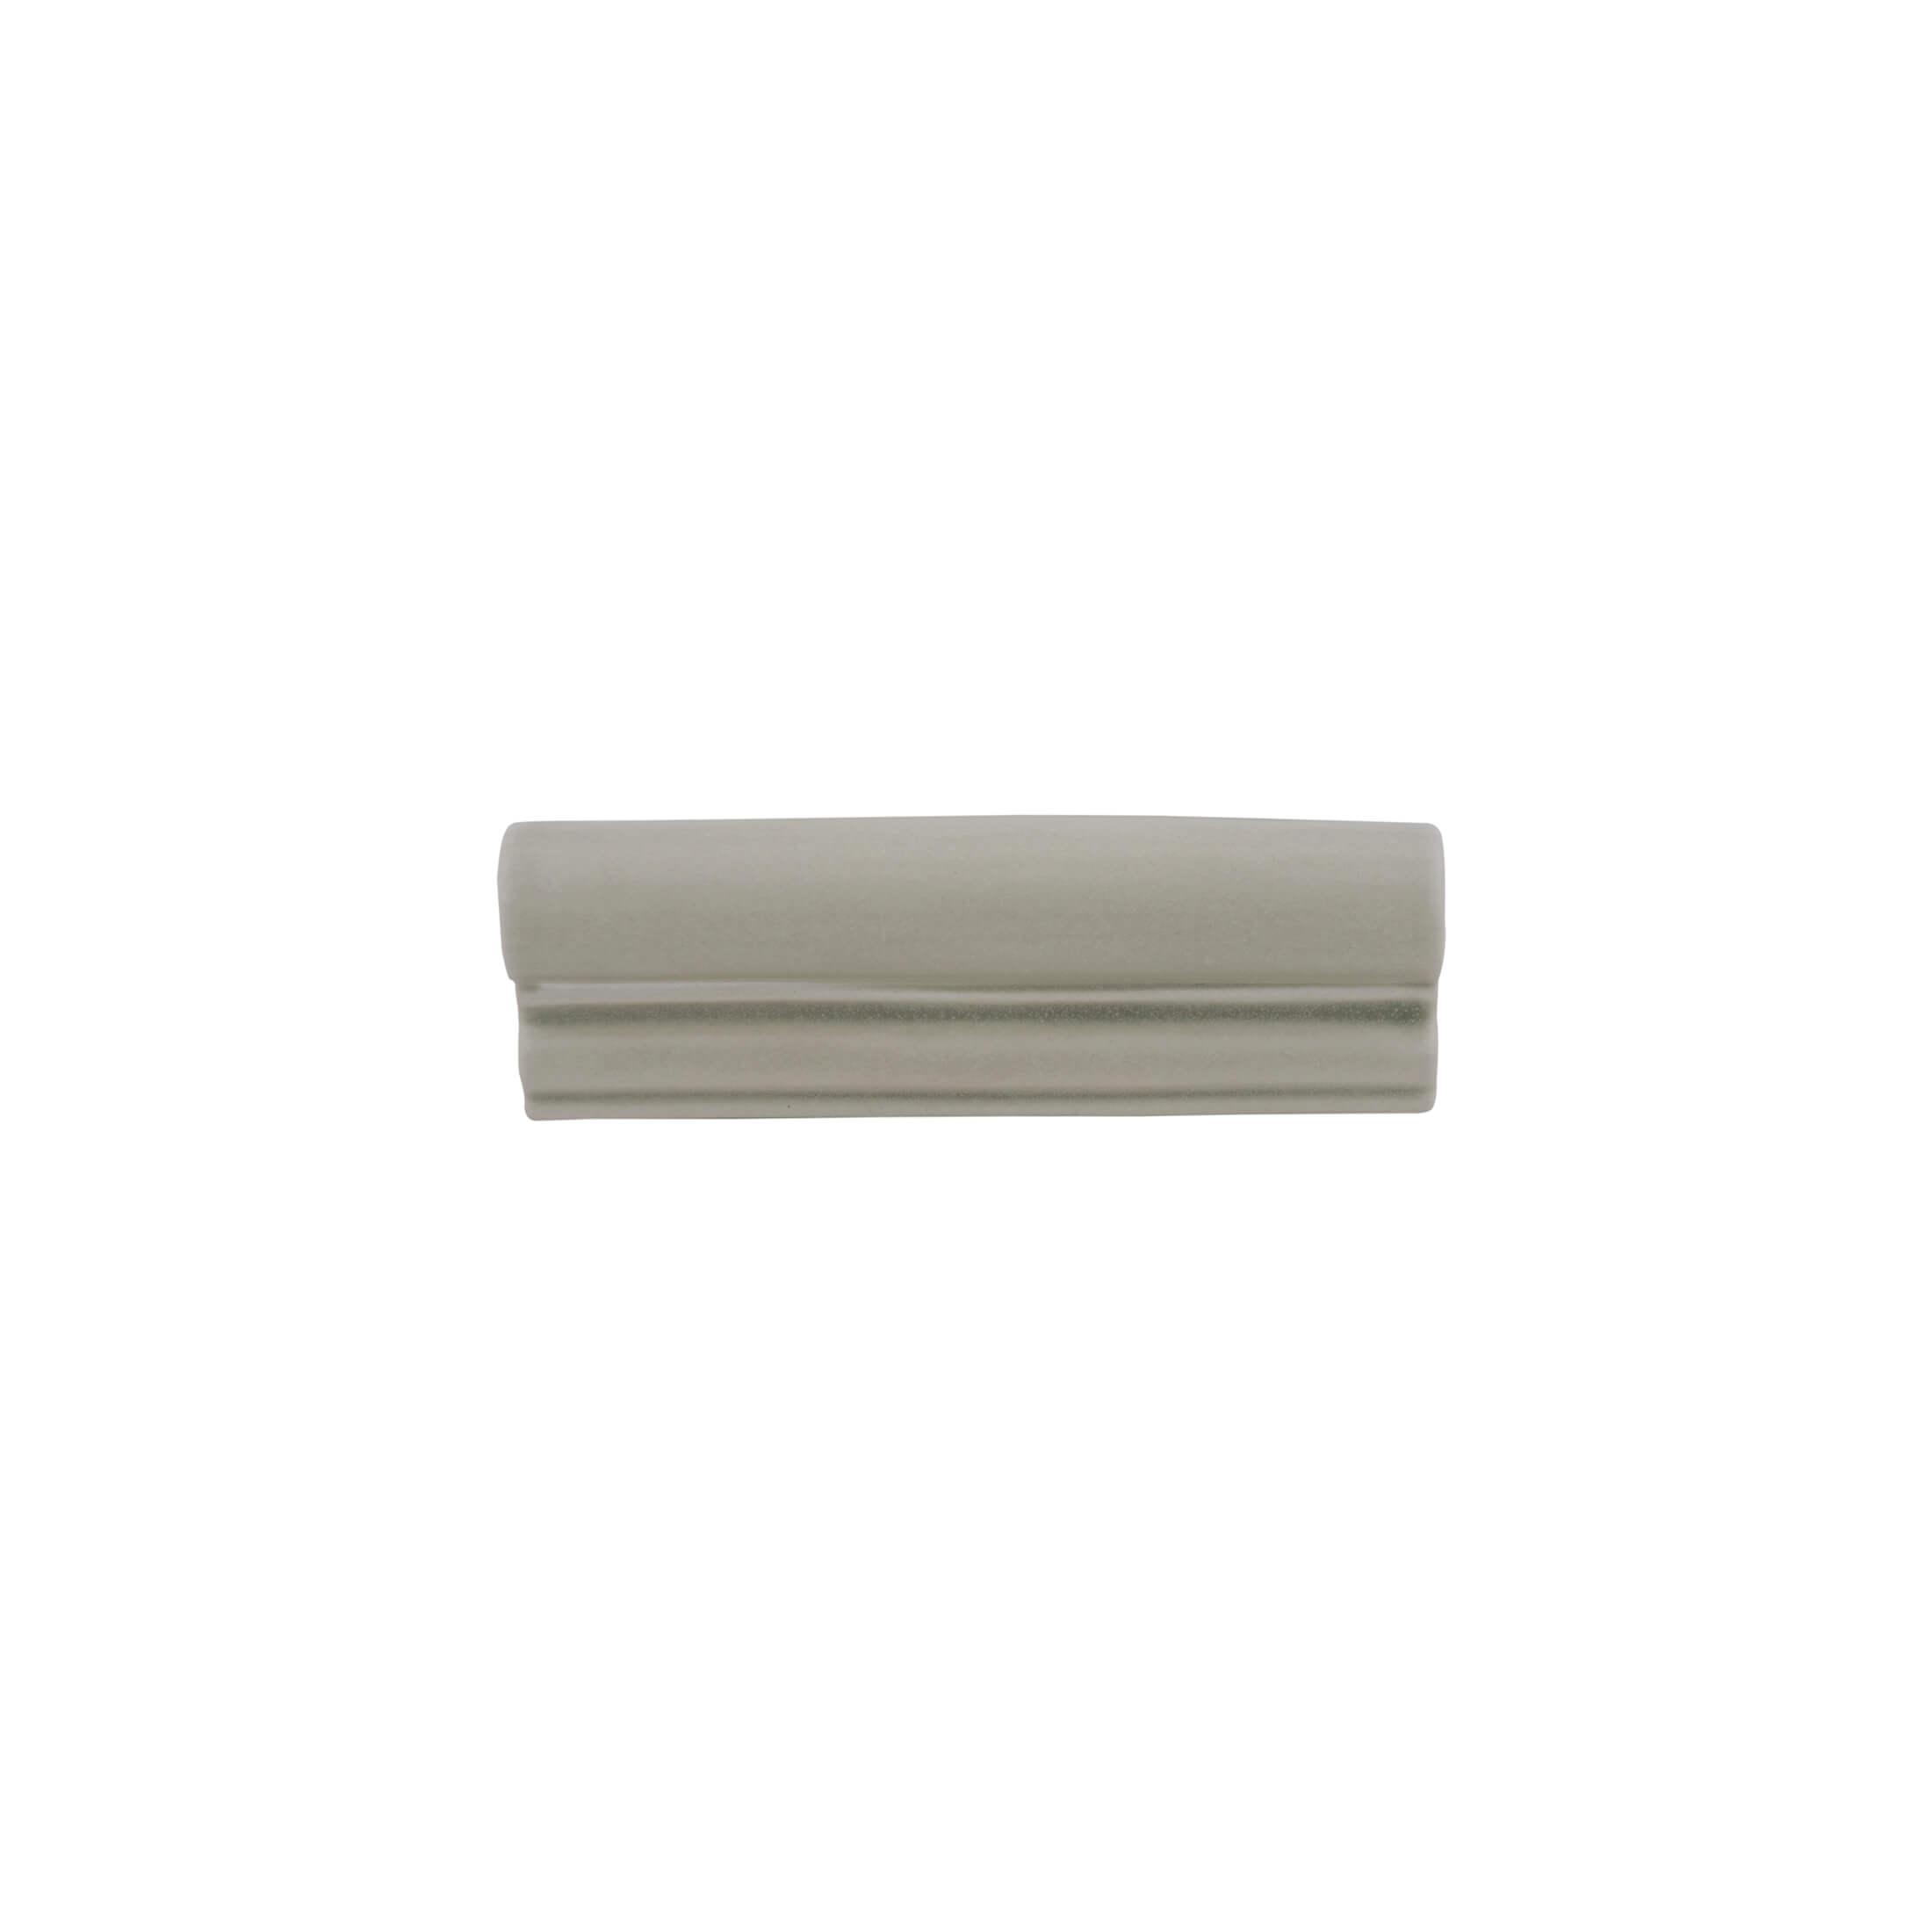 ADNT5003 - MOLDURA  - 5 cm X 15 cm